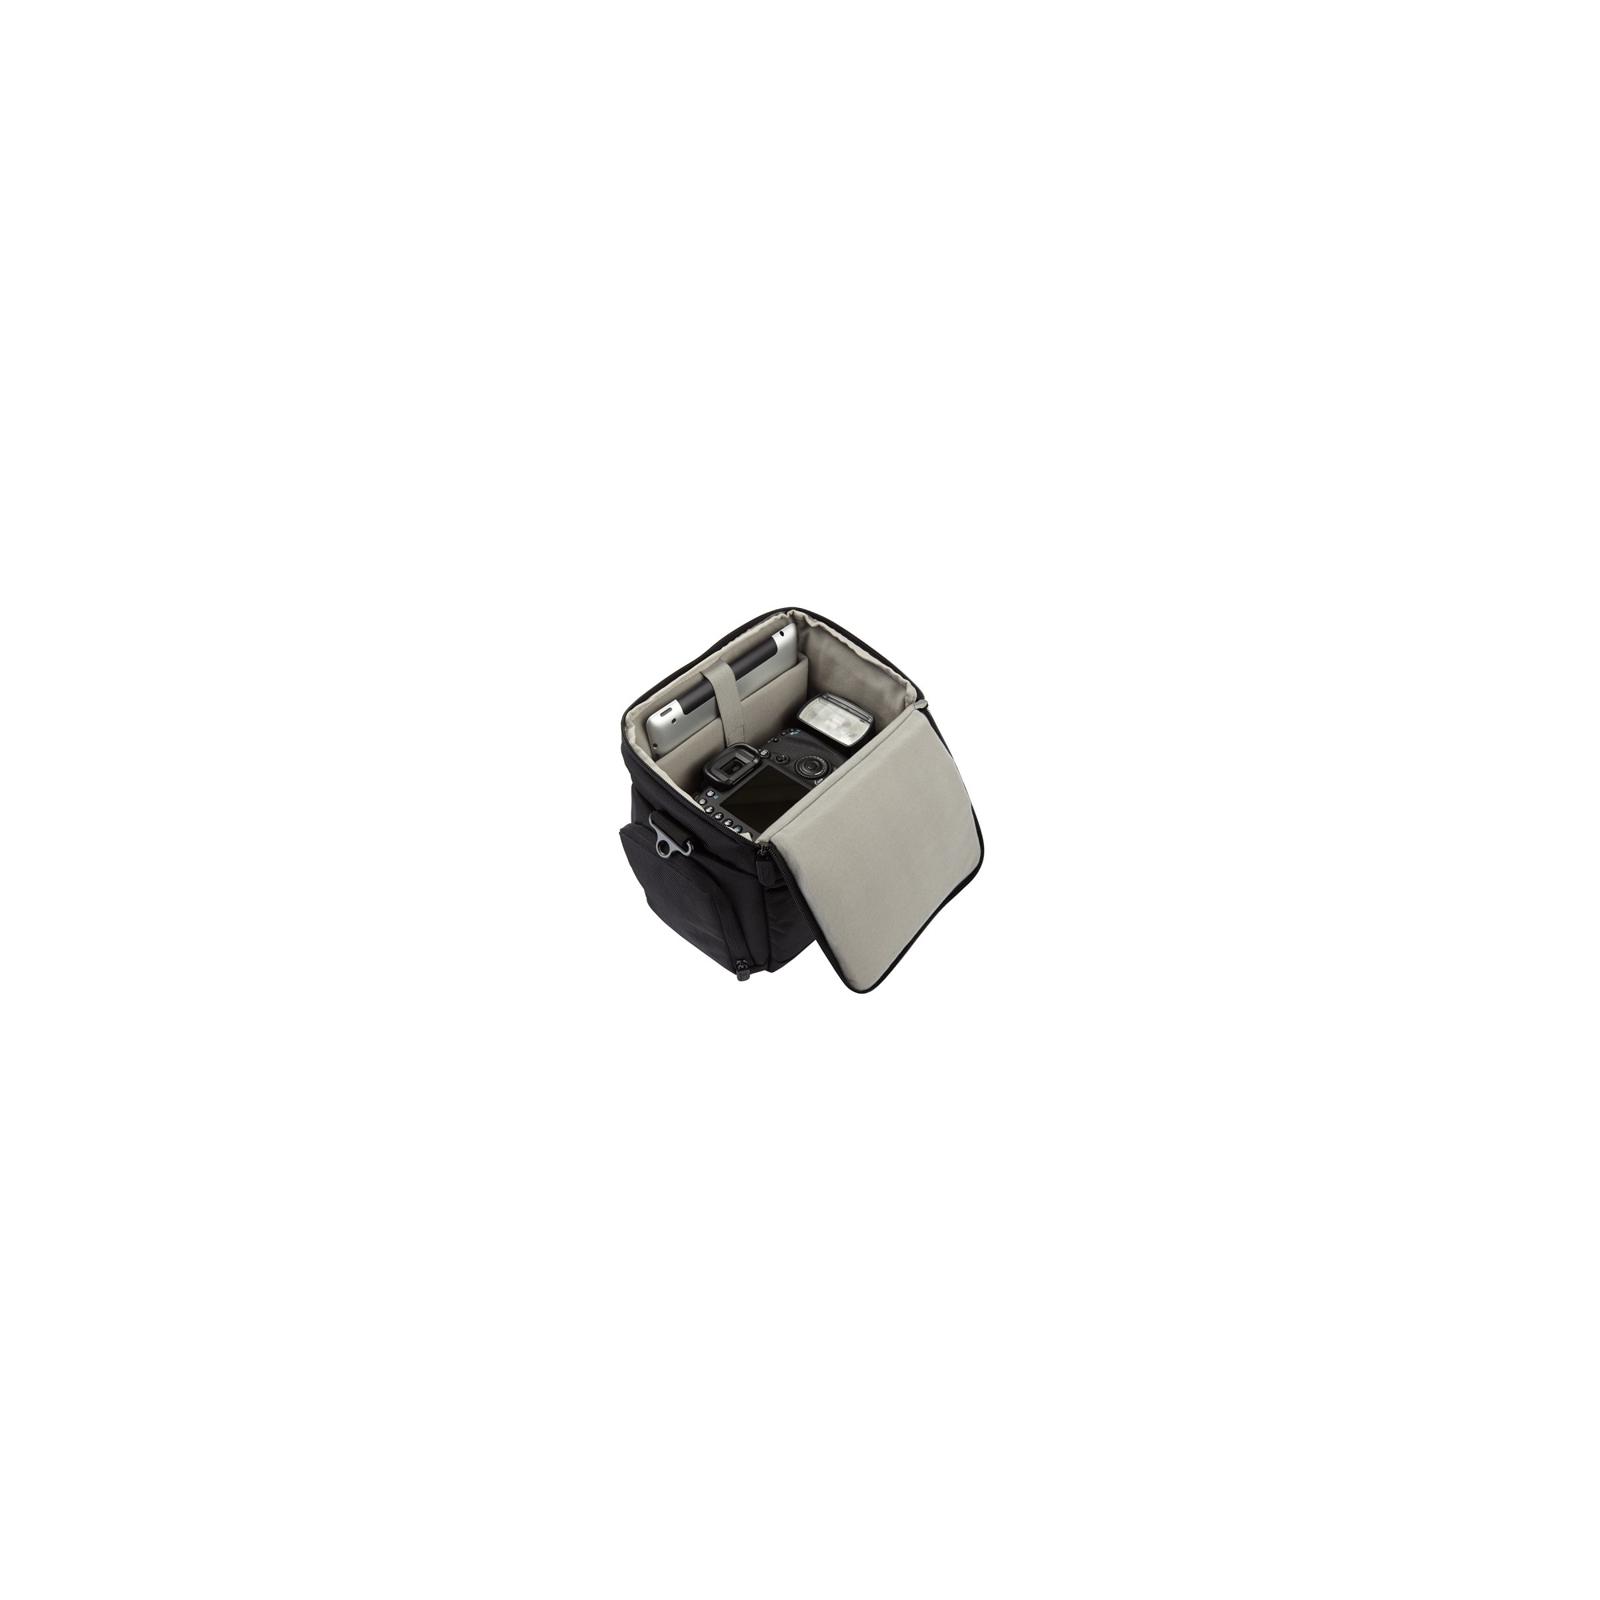 Фото-сумка RivaCase SLR Case (7230 (NL) Black) изображение 2